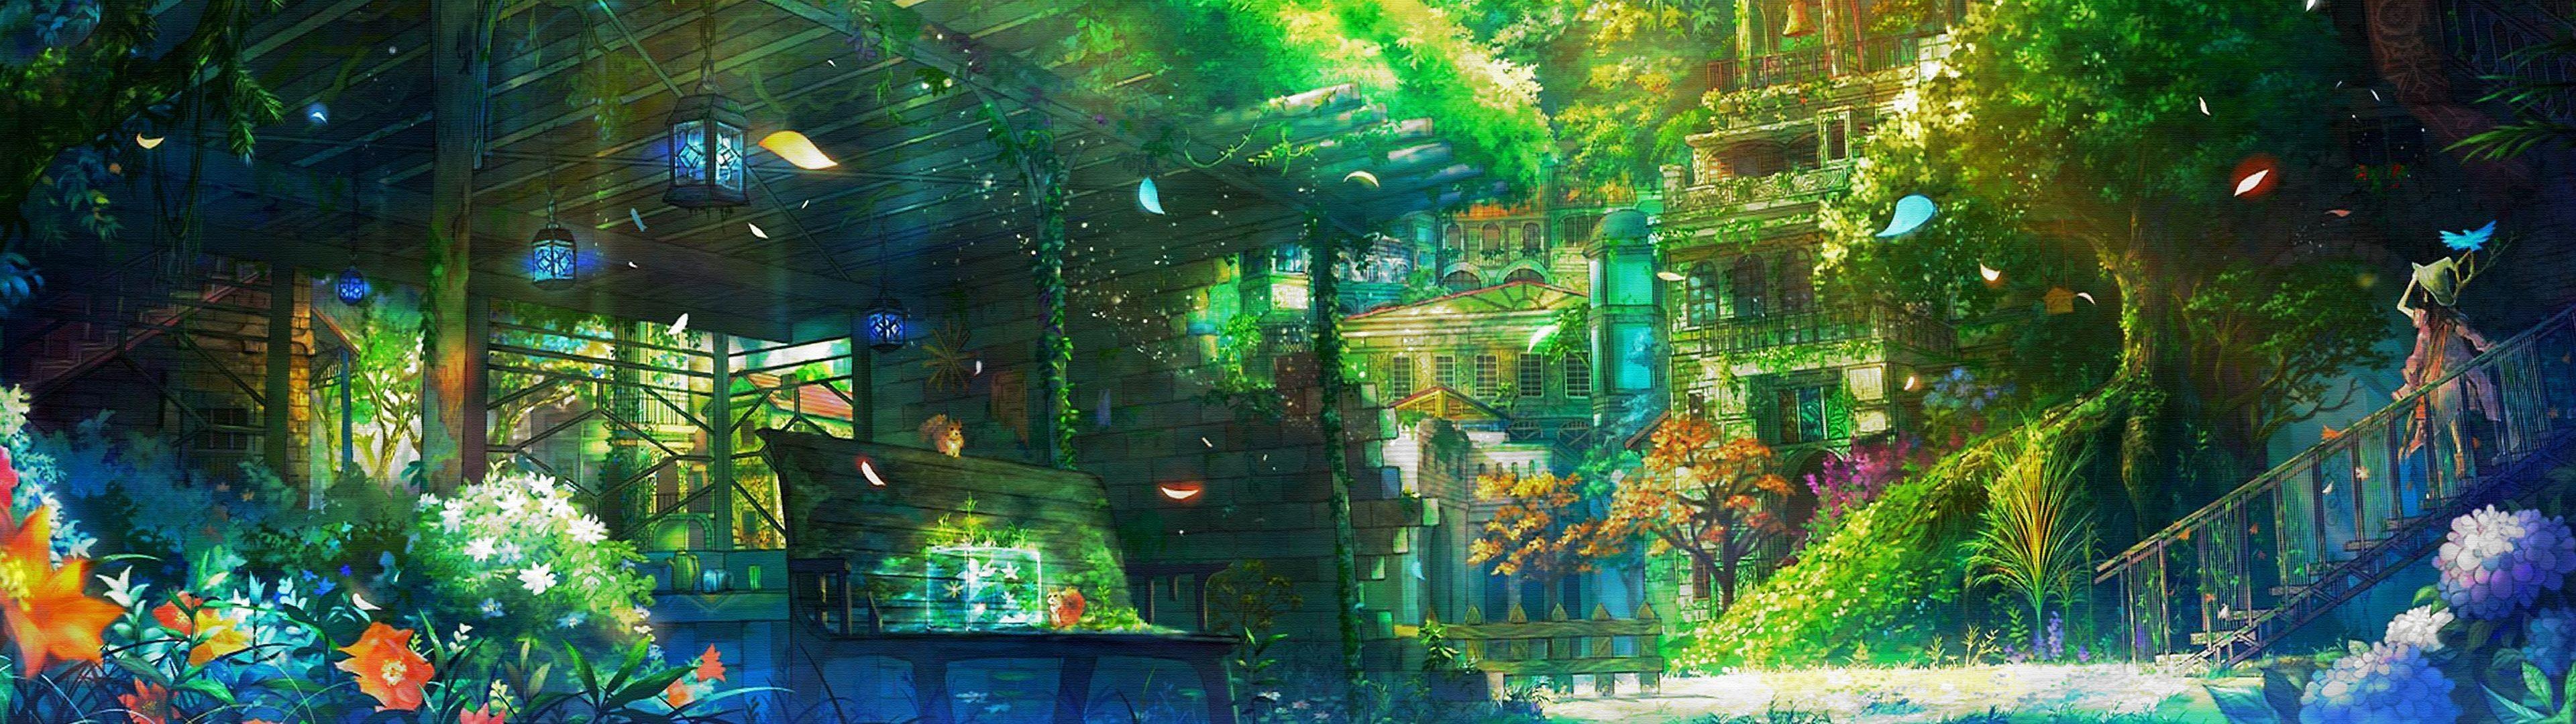 Anime Computer Wallpapers, Desktop Backgrounds